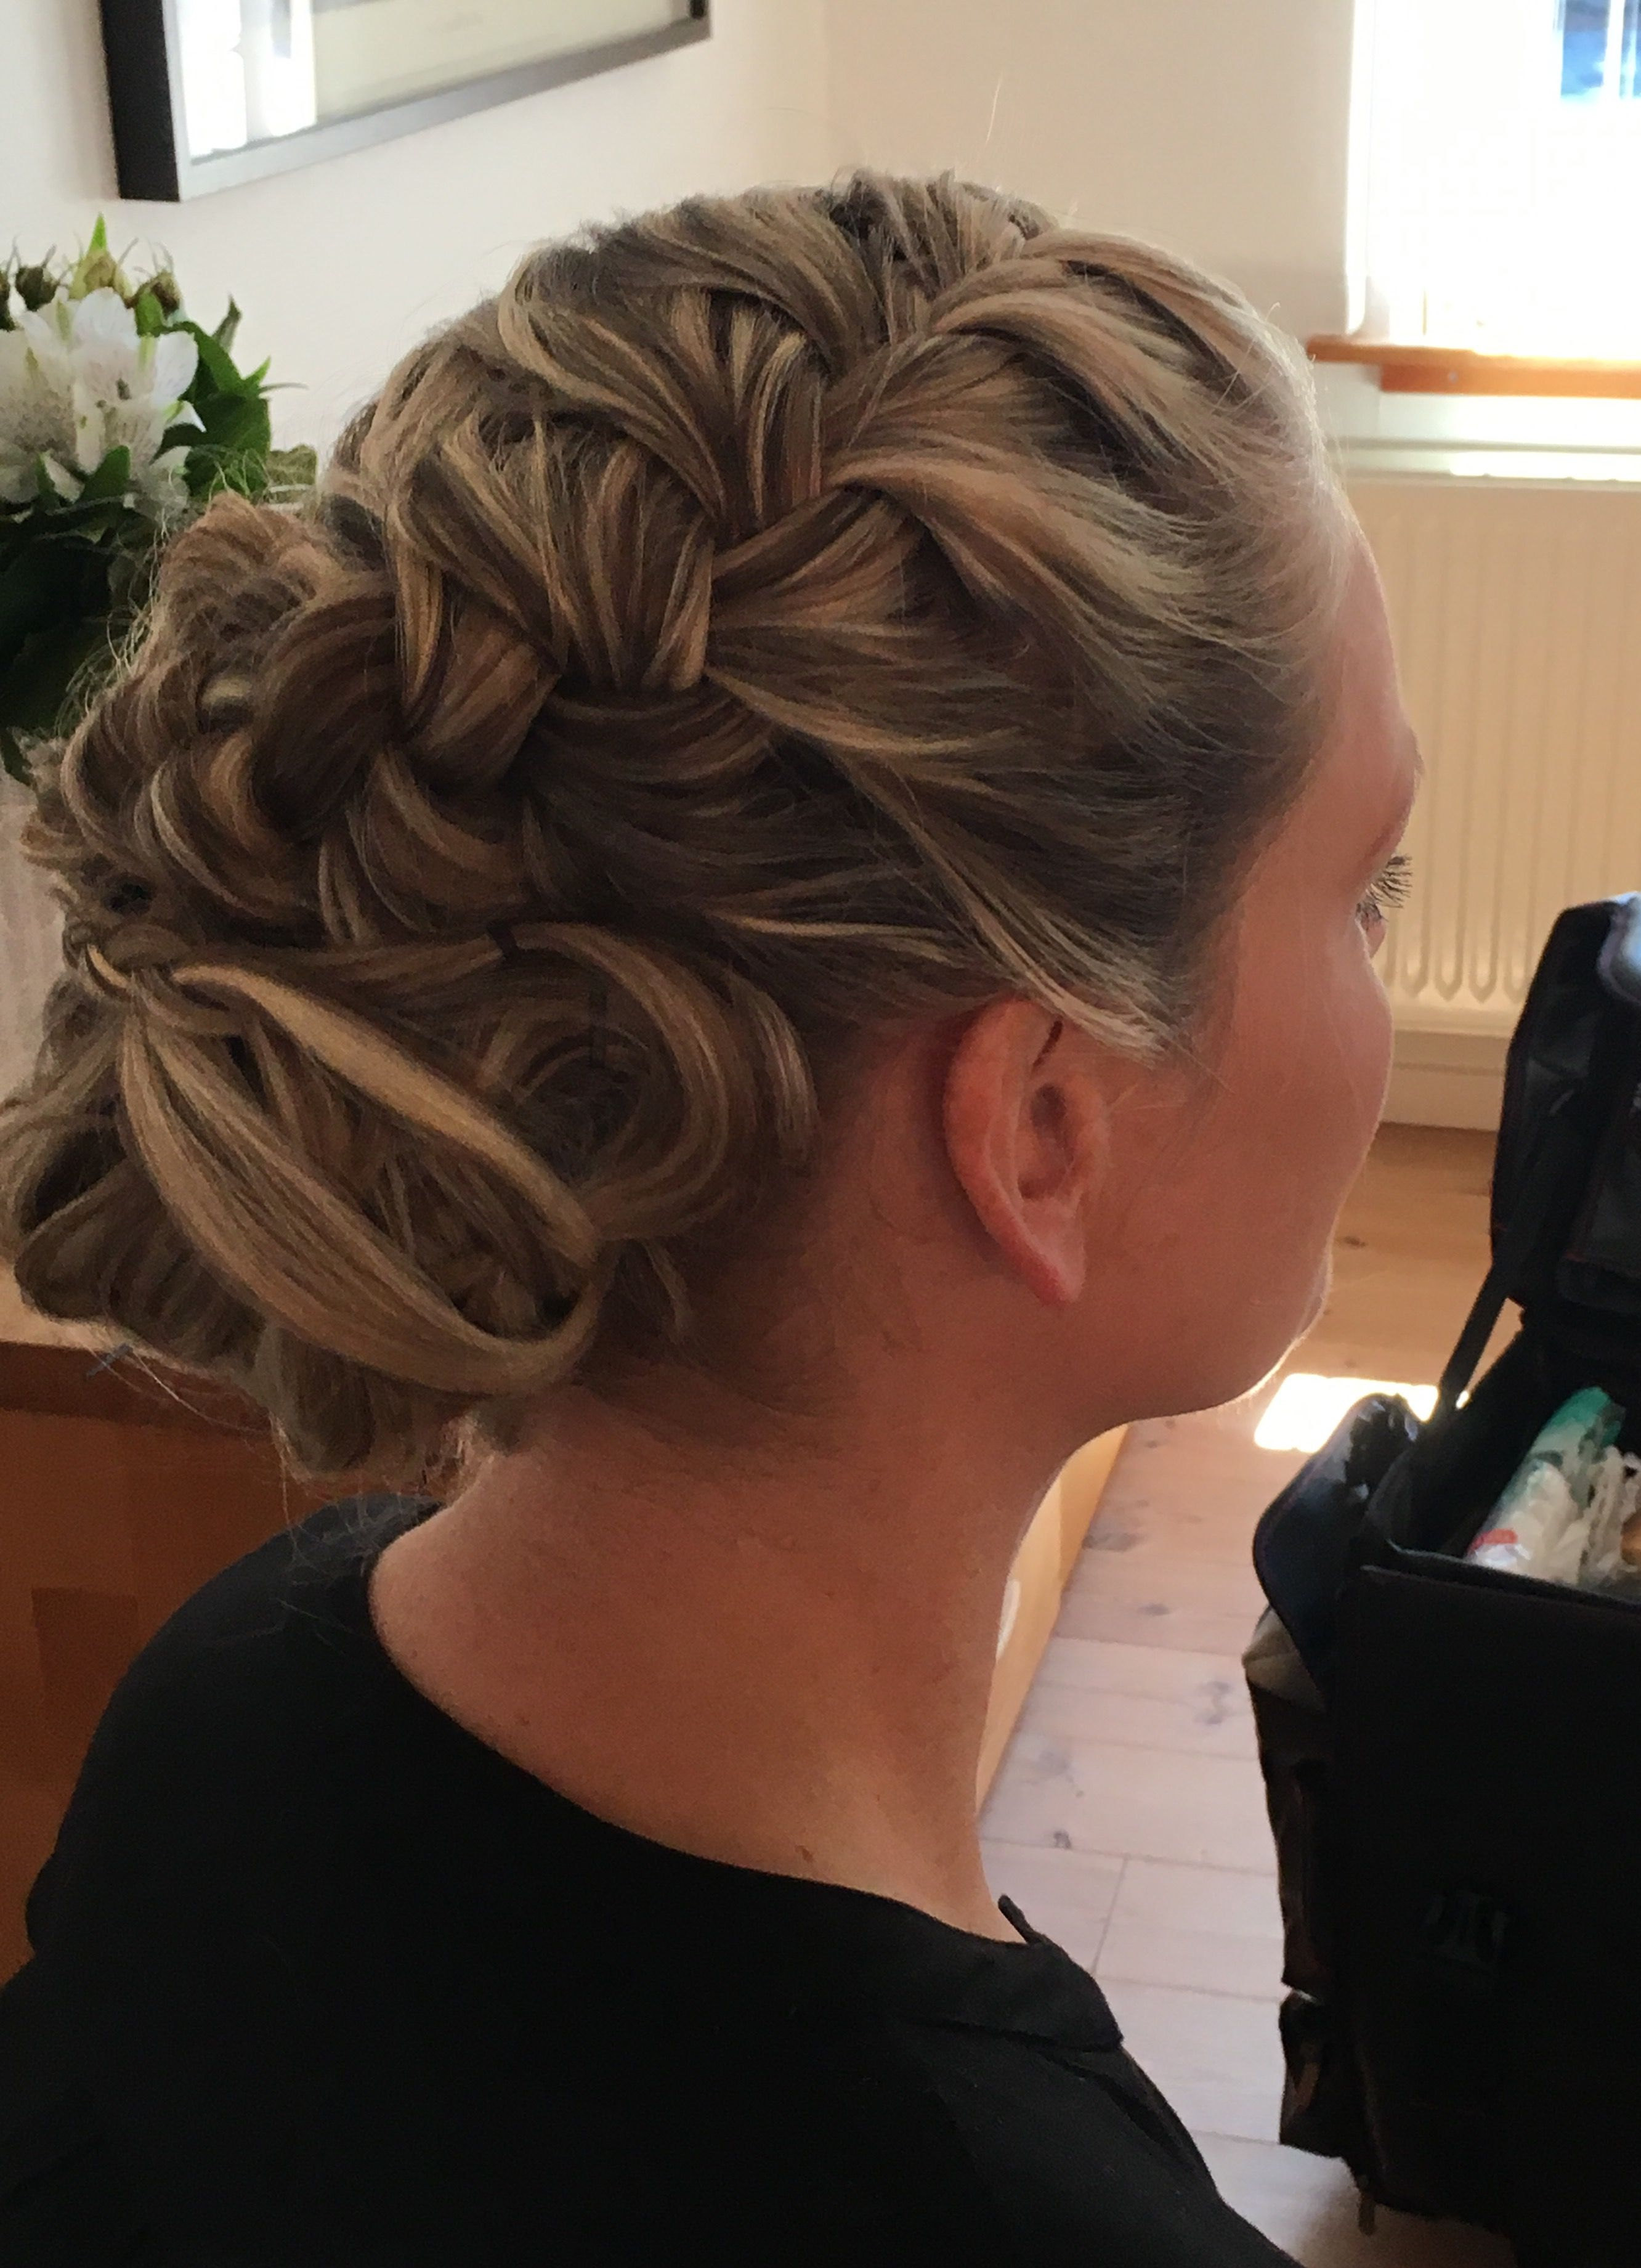 Brudestyling Dk Bryllup2019 Beautystudio Weddingstudio Weddingclub Brudemakeup Har Og Makeup Til Bryllup Bridal Makeu Harprodukter Updo Bryllupsfrisurer